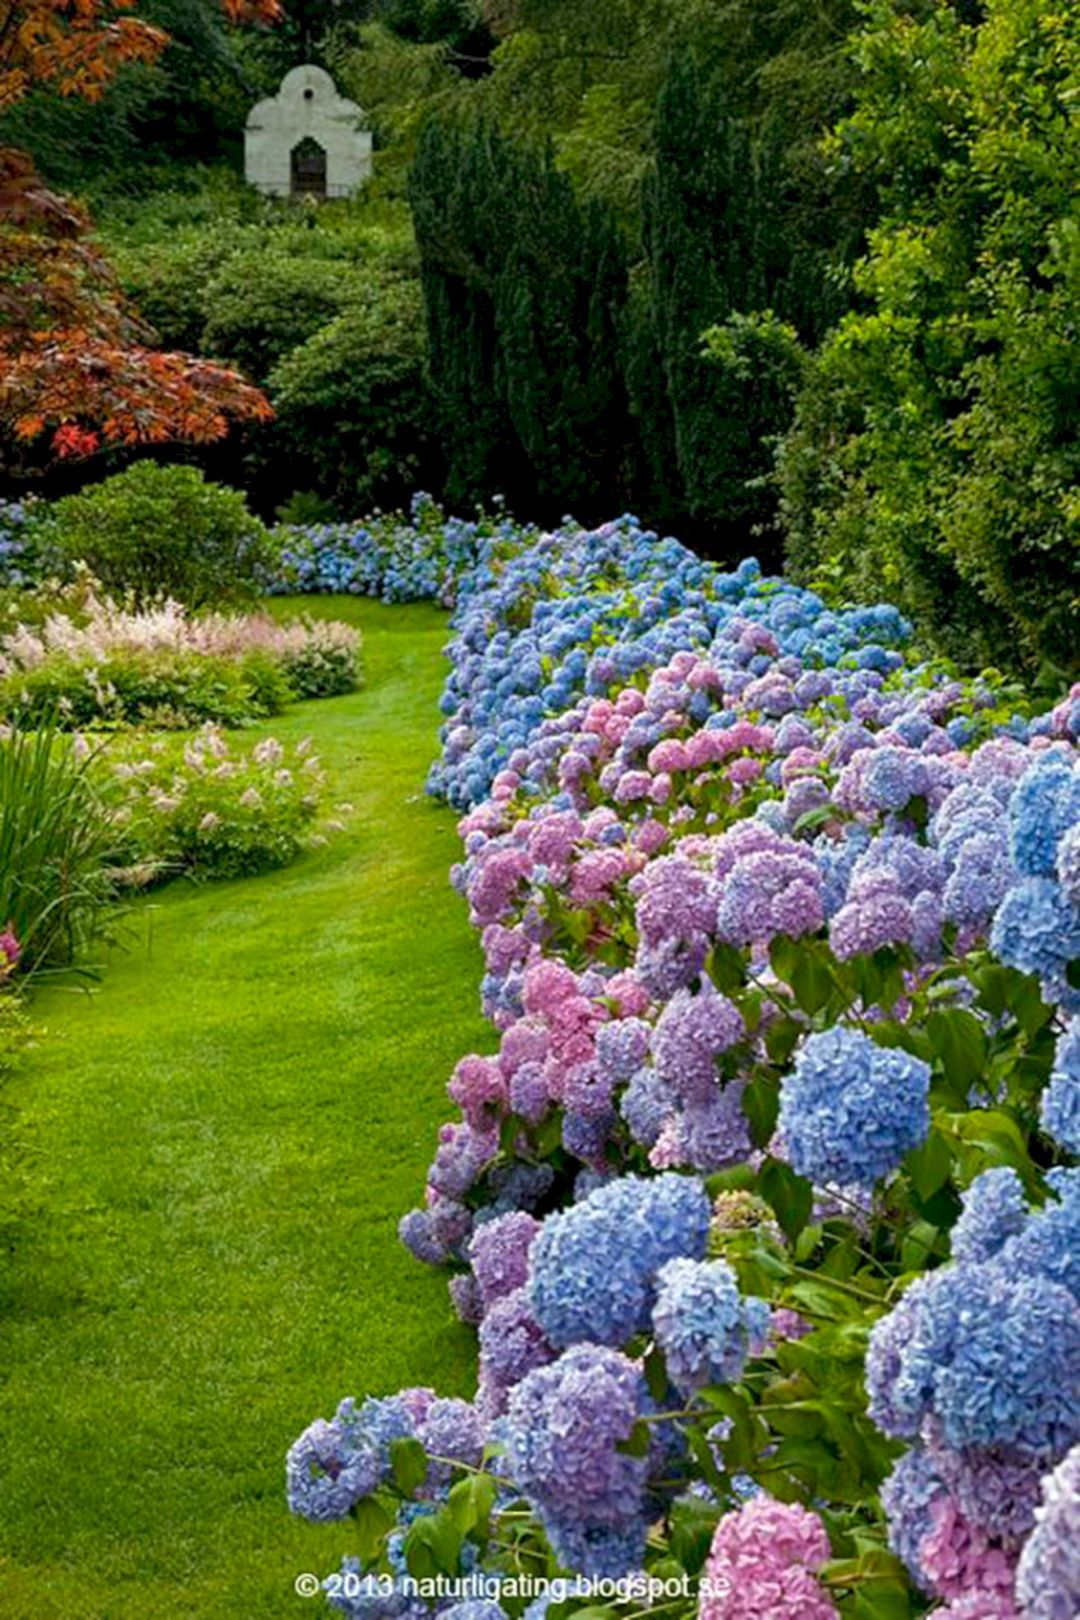 50 Most Beautiful Hydrangeas Landscaping Ideas To Inspire You 025 Hydrangea Landscaping Hydrangea Garden Garden Shrubs